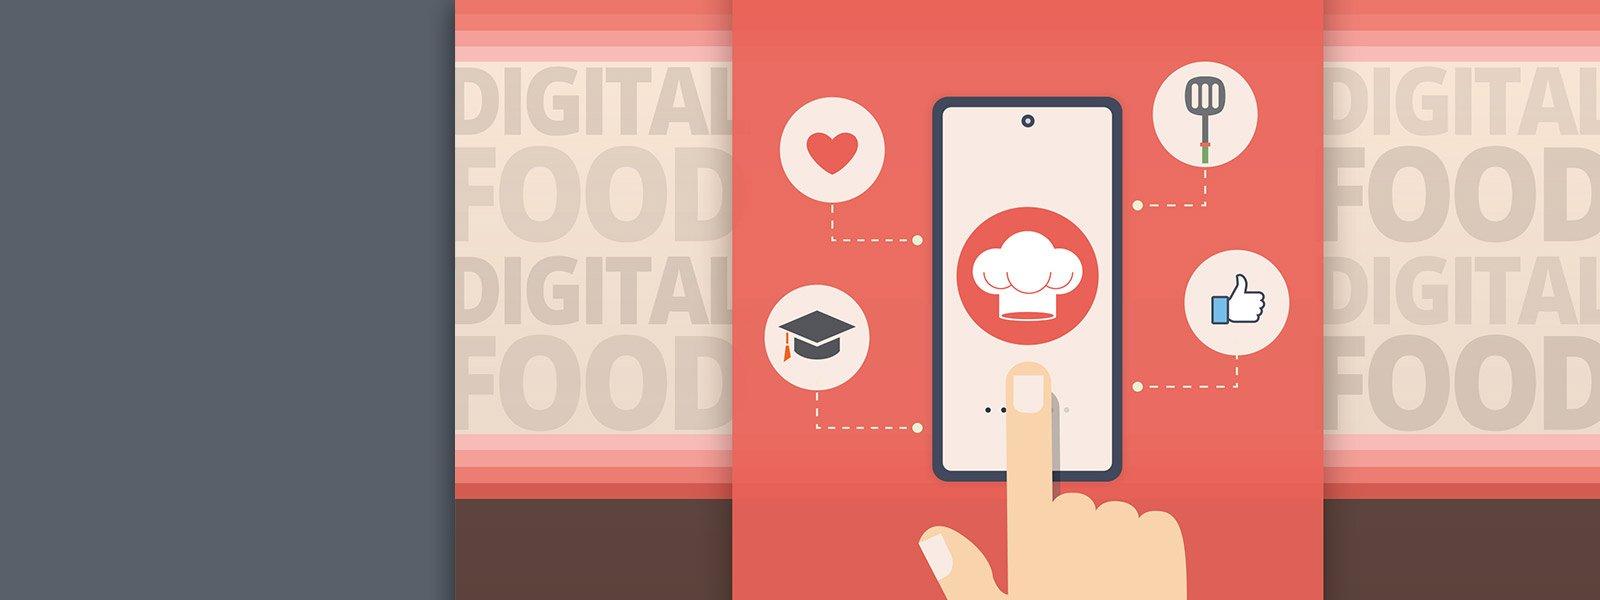 Muse Comunicazione - DFMLab Digital Food Marketing Corso Base